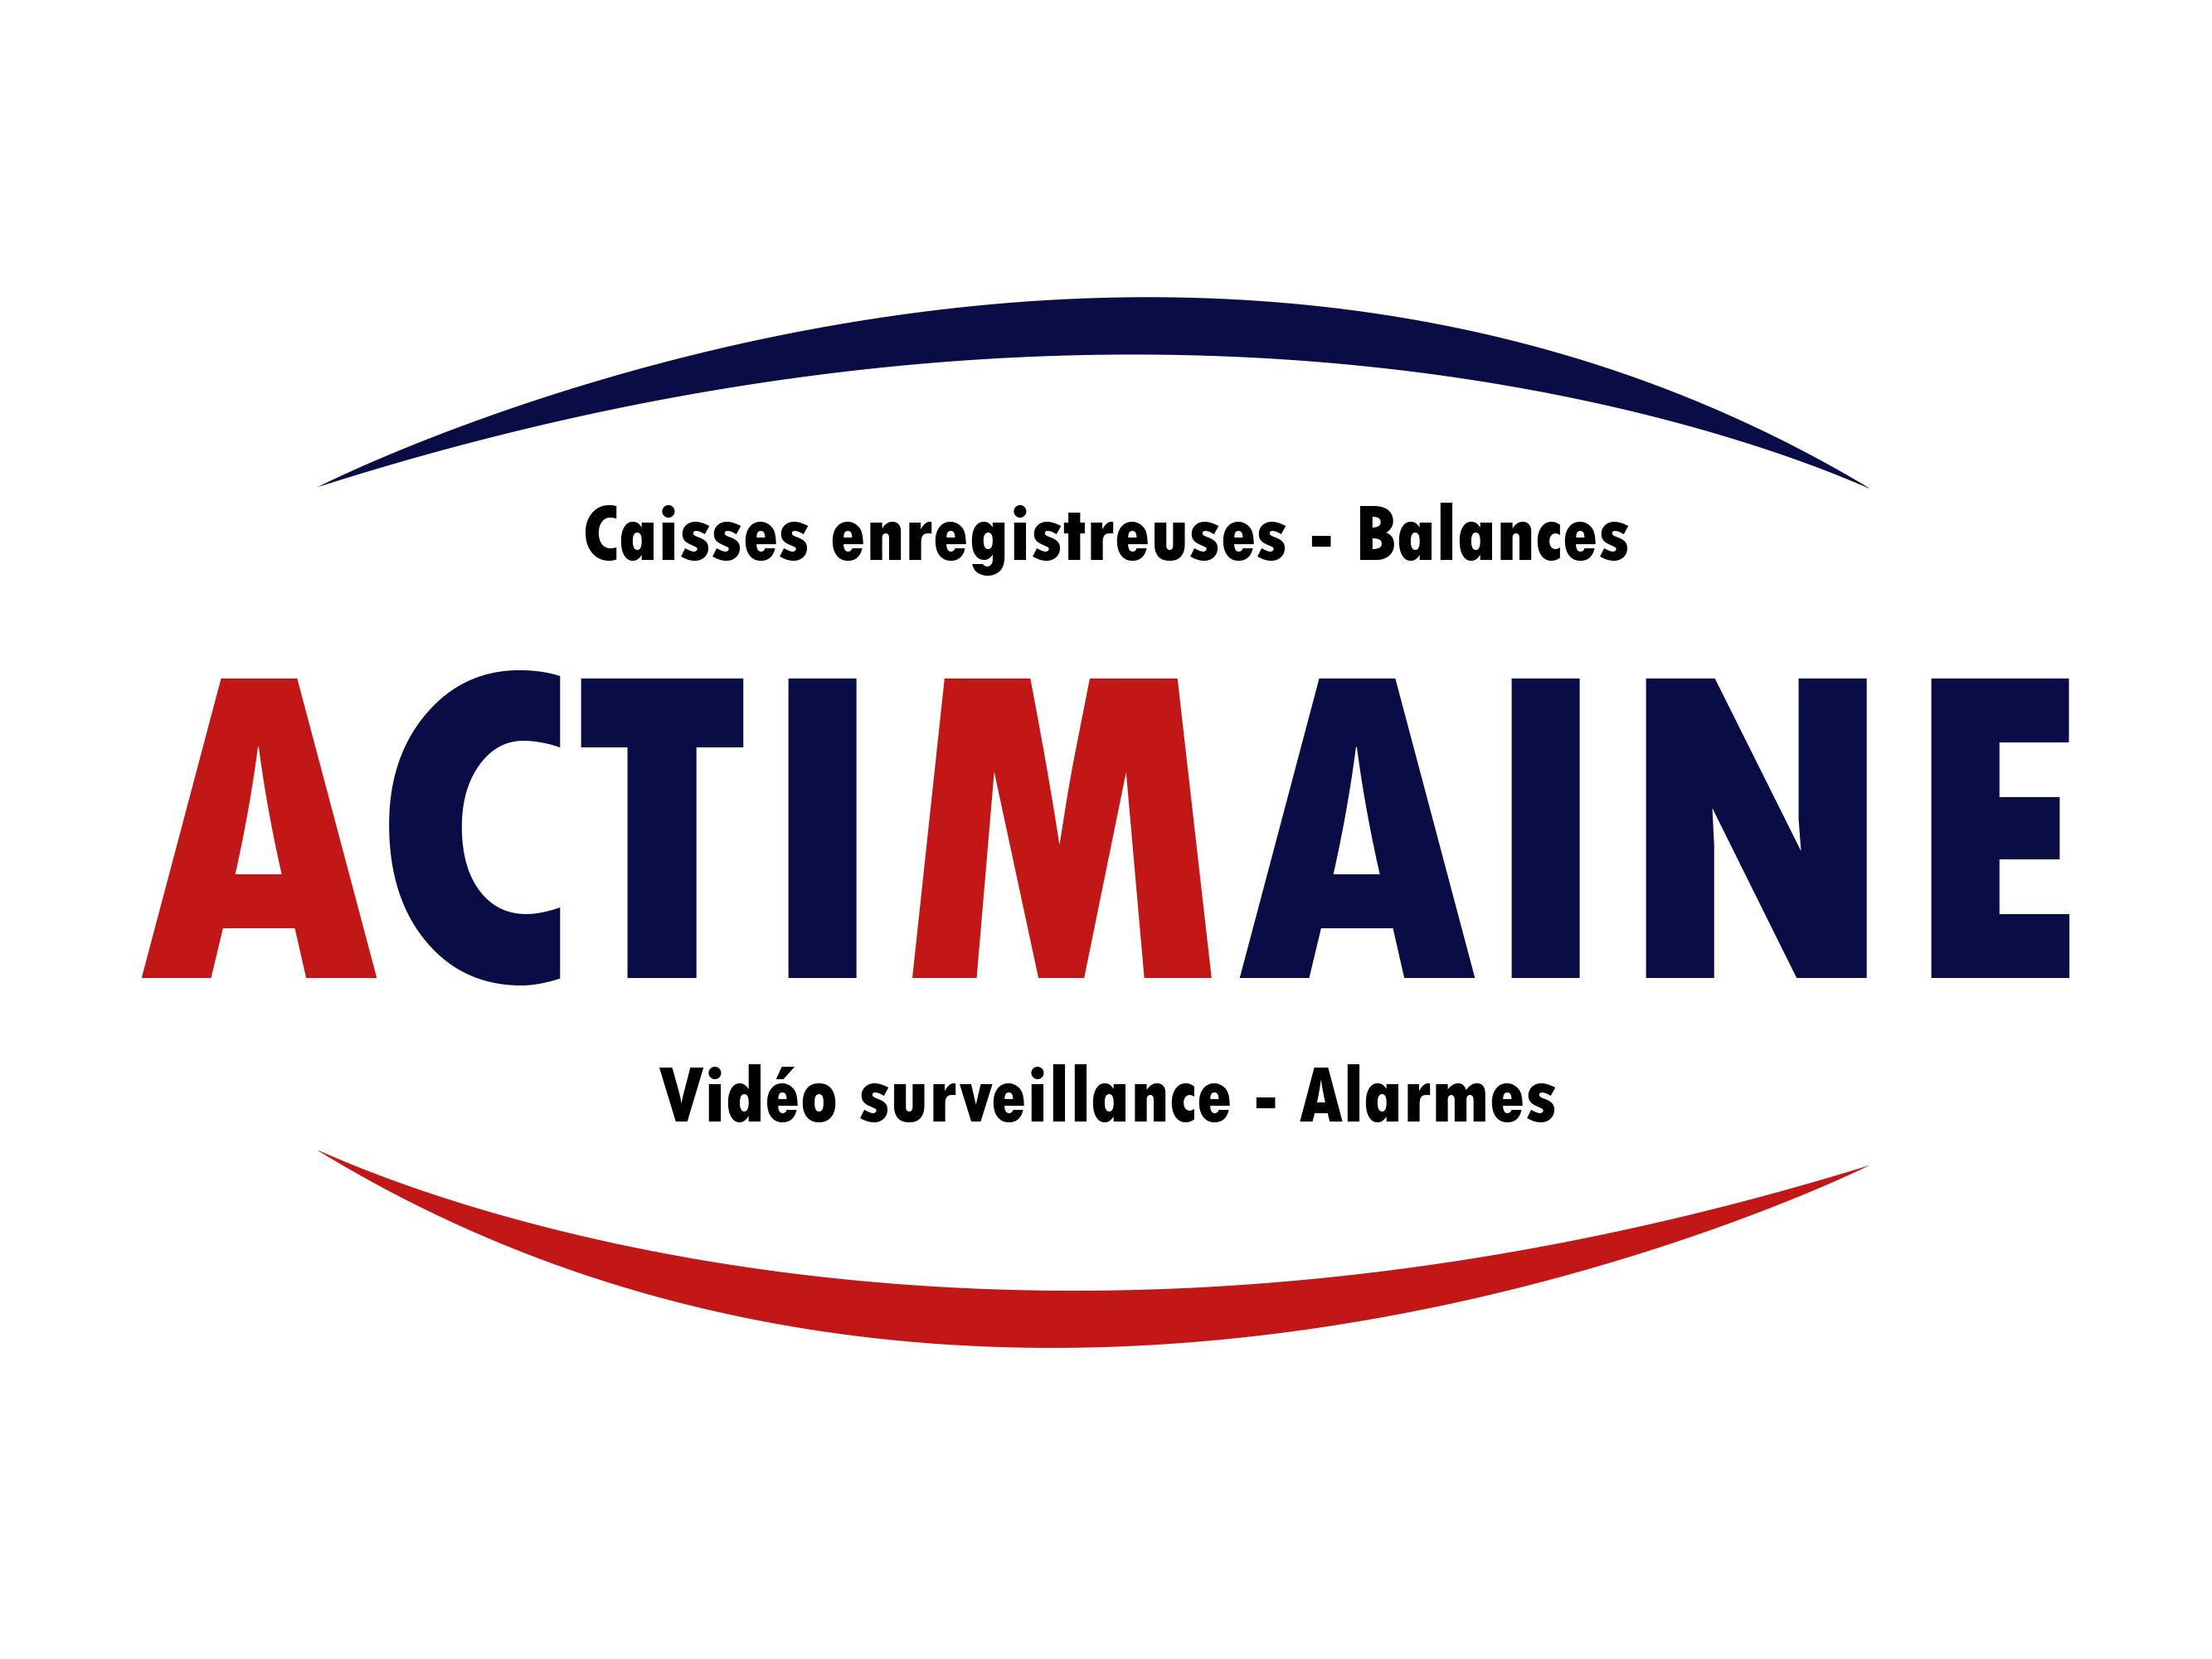 actimaine